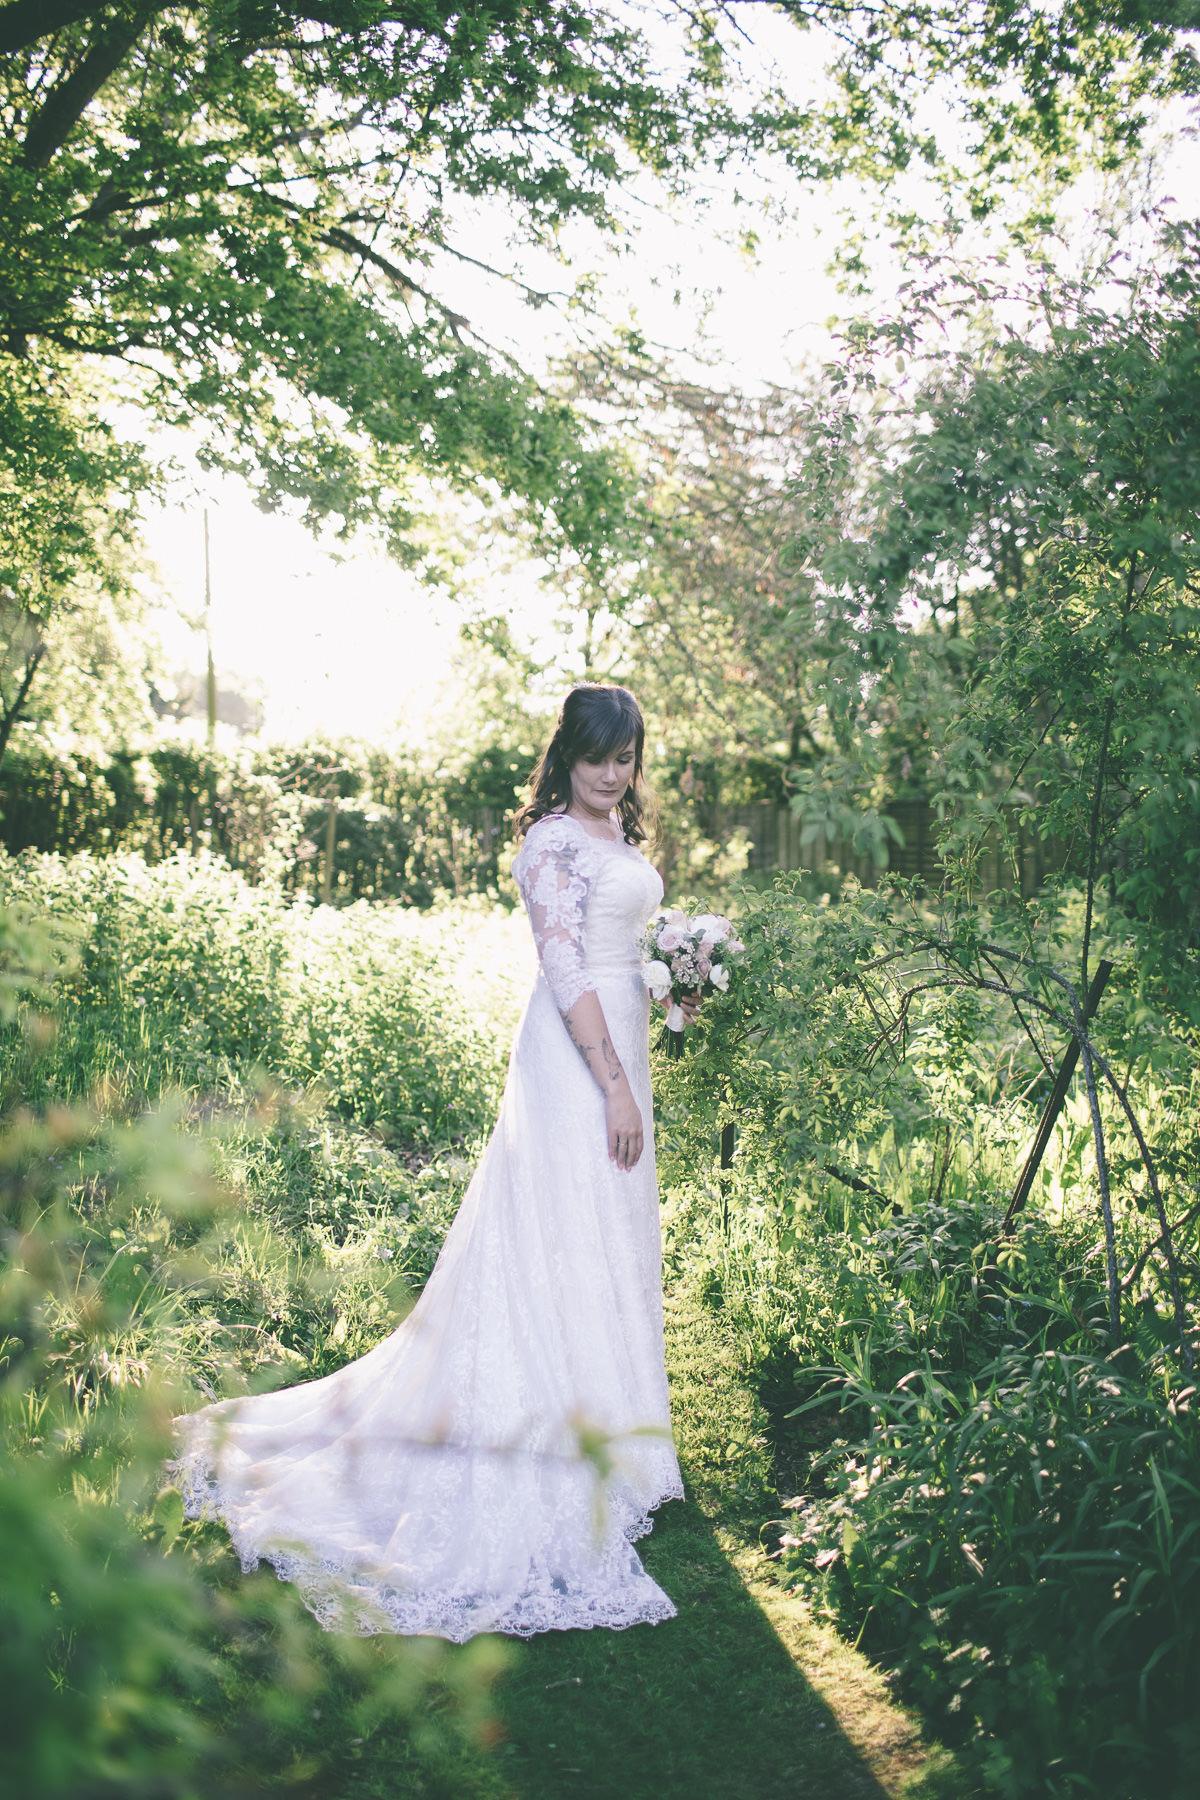 Pamber-Place-wedding-photography-basingstoke-hampshire-197